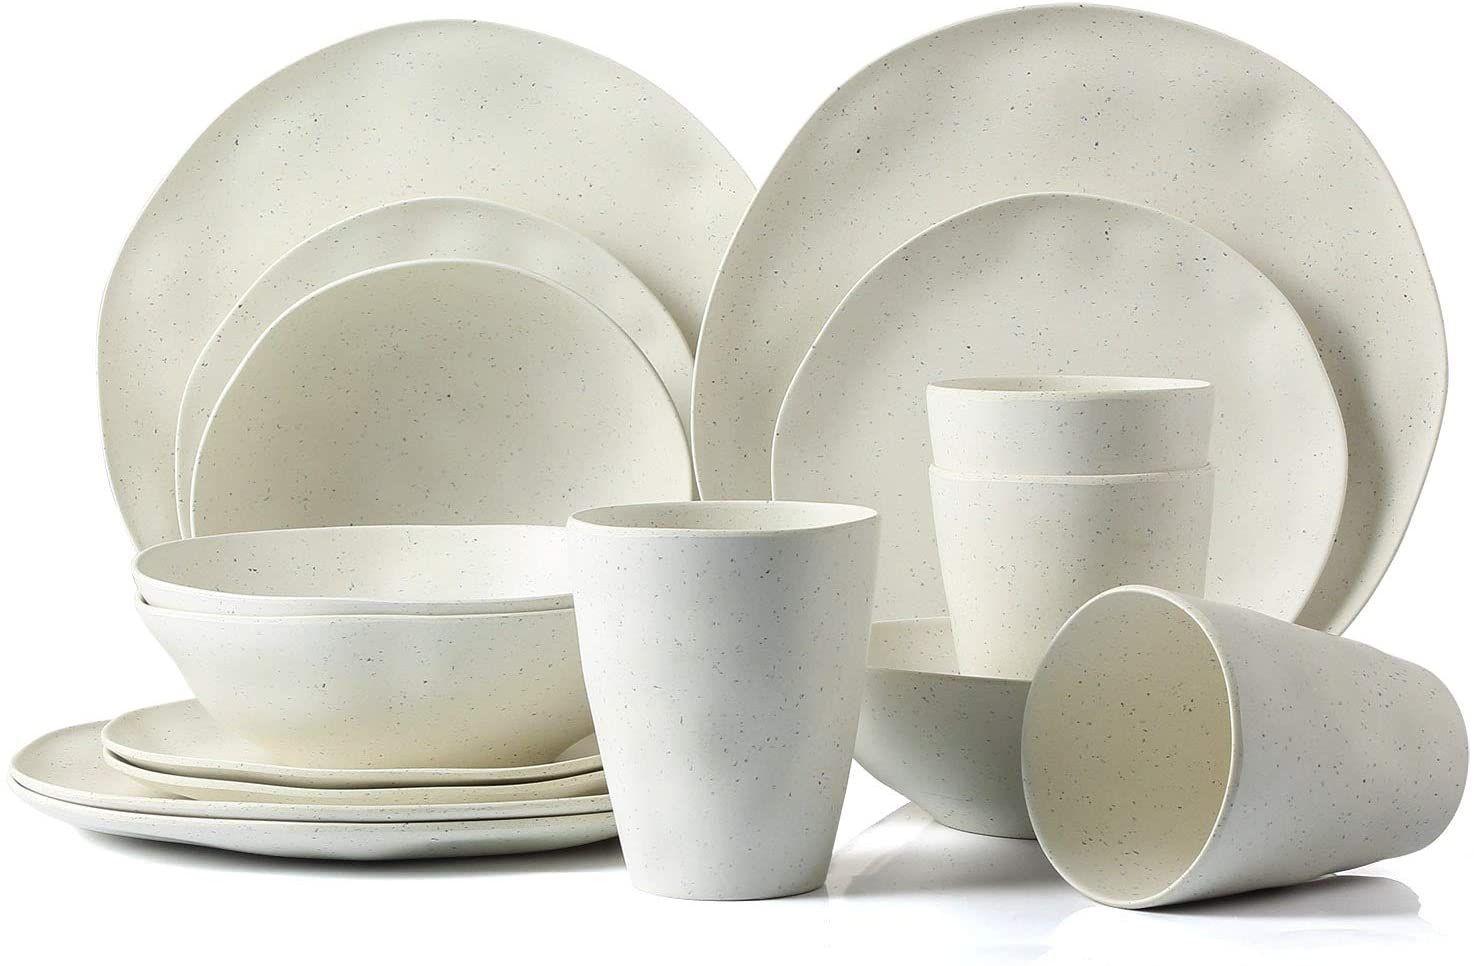 Lekoch Bamboo Dinnerware Set